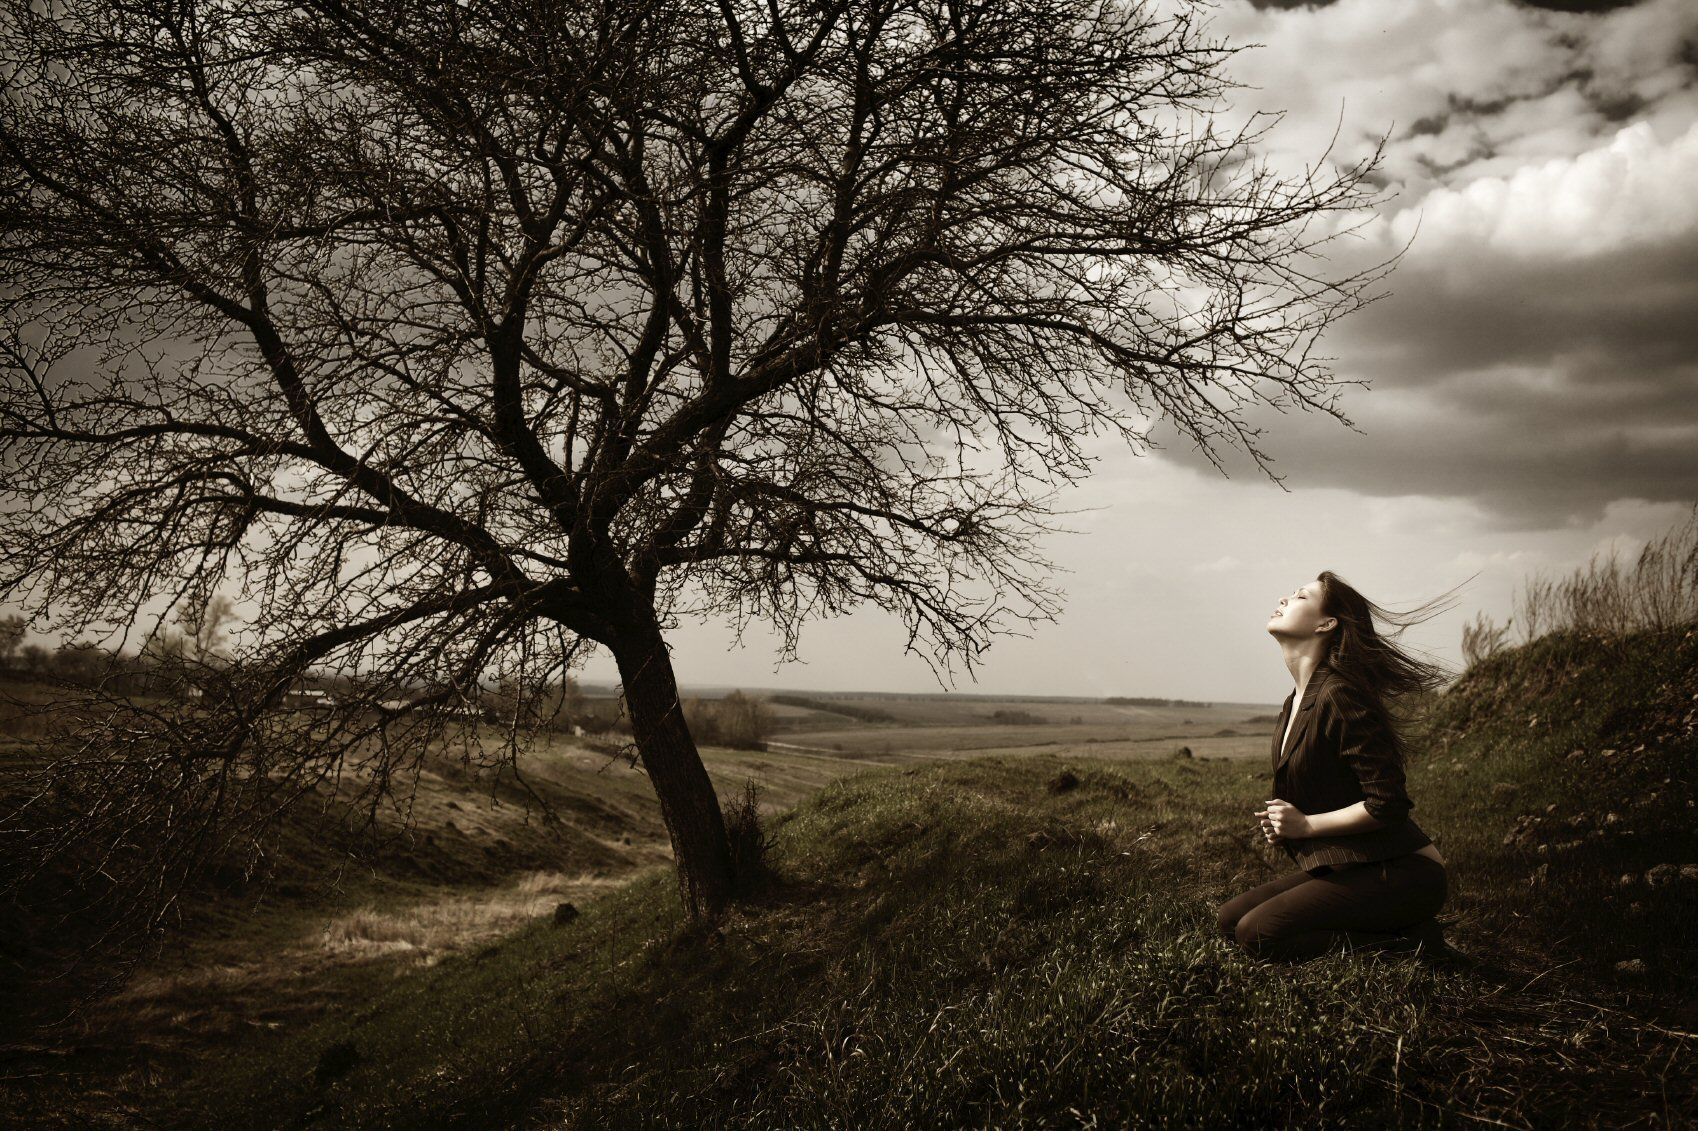 Desperate-woman-in-prayer1.jpg